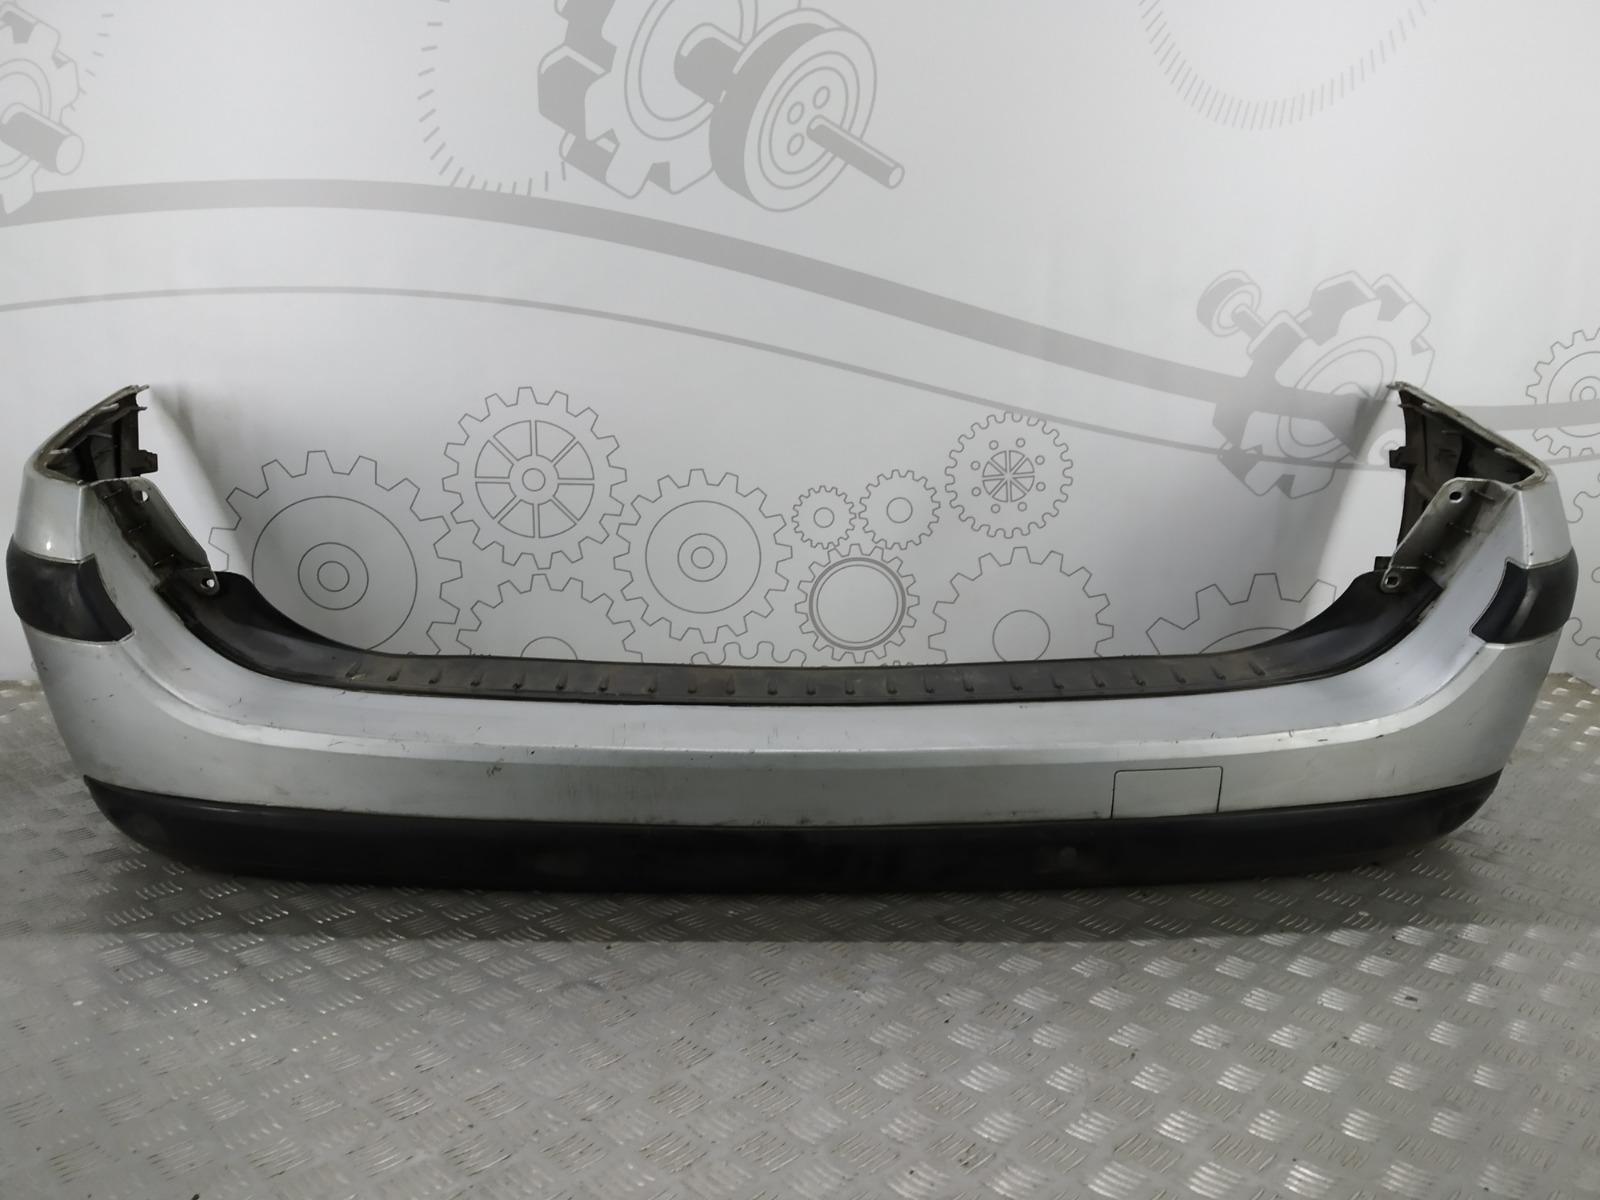 Бампер задний Citroen C5 1.6 HDI 2004 (б/у)